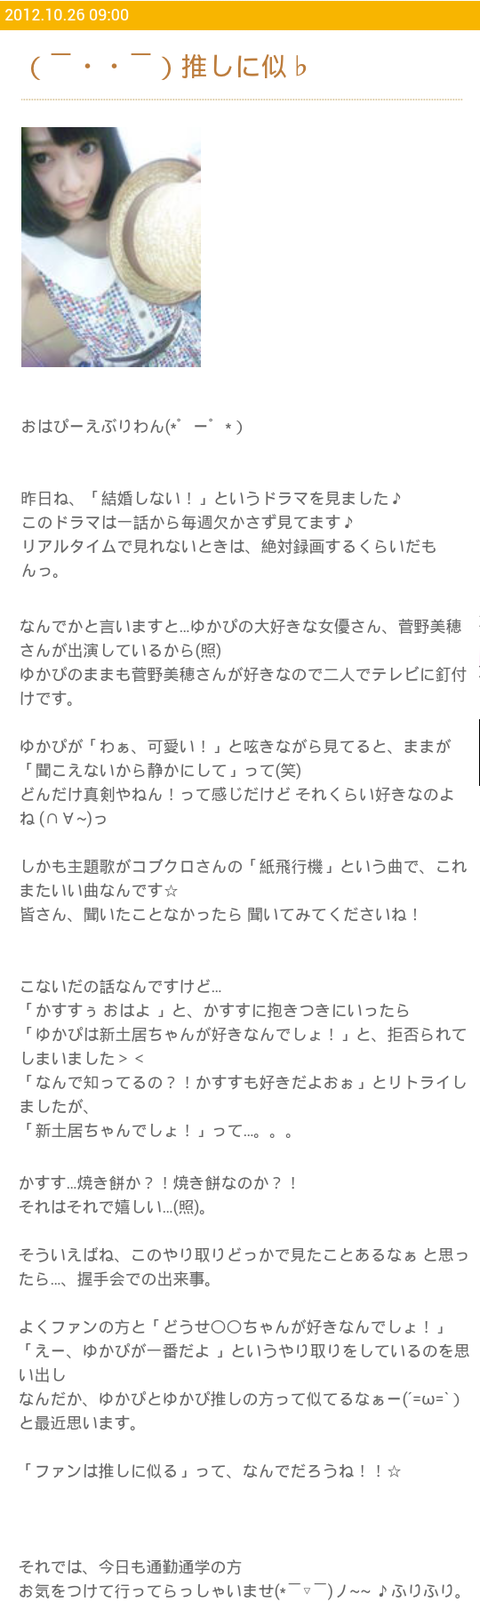 Screenshot_2012-10-26-09-47-34